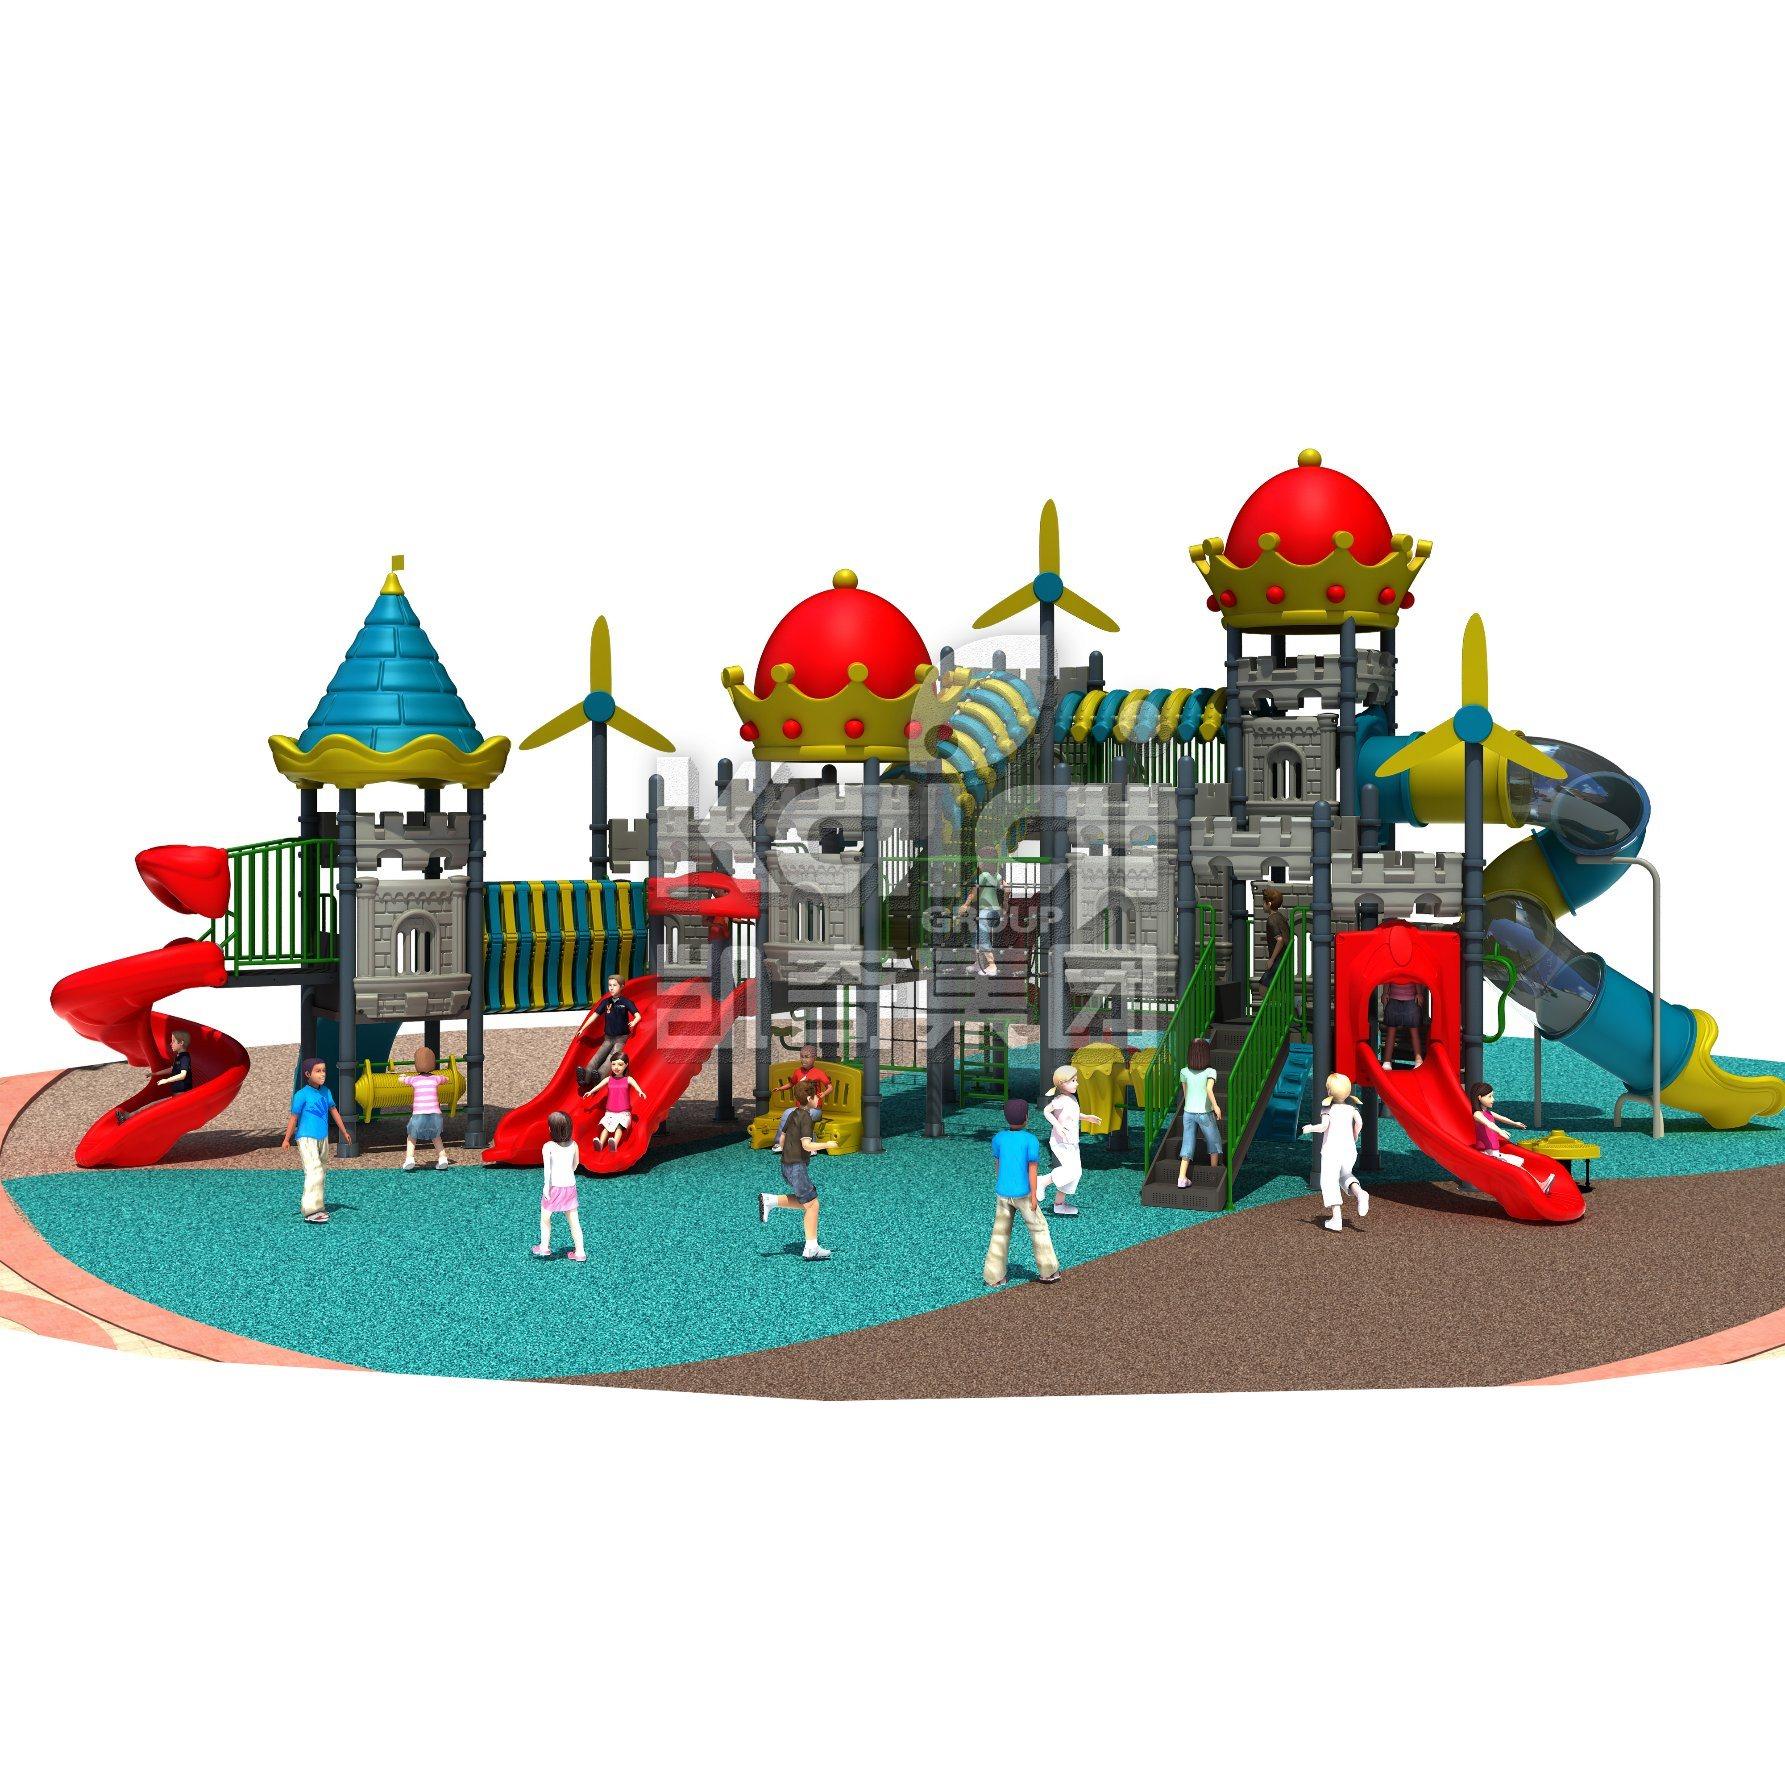 China Playground Outdoor Playground Indoor Playground supplier